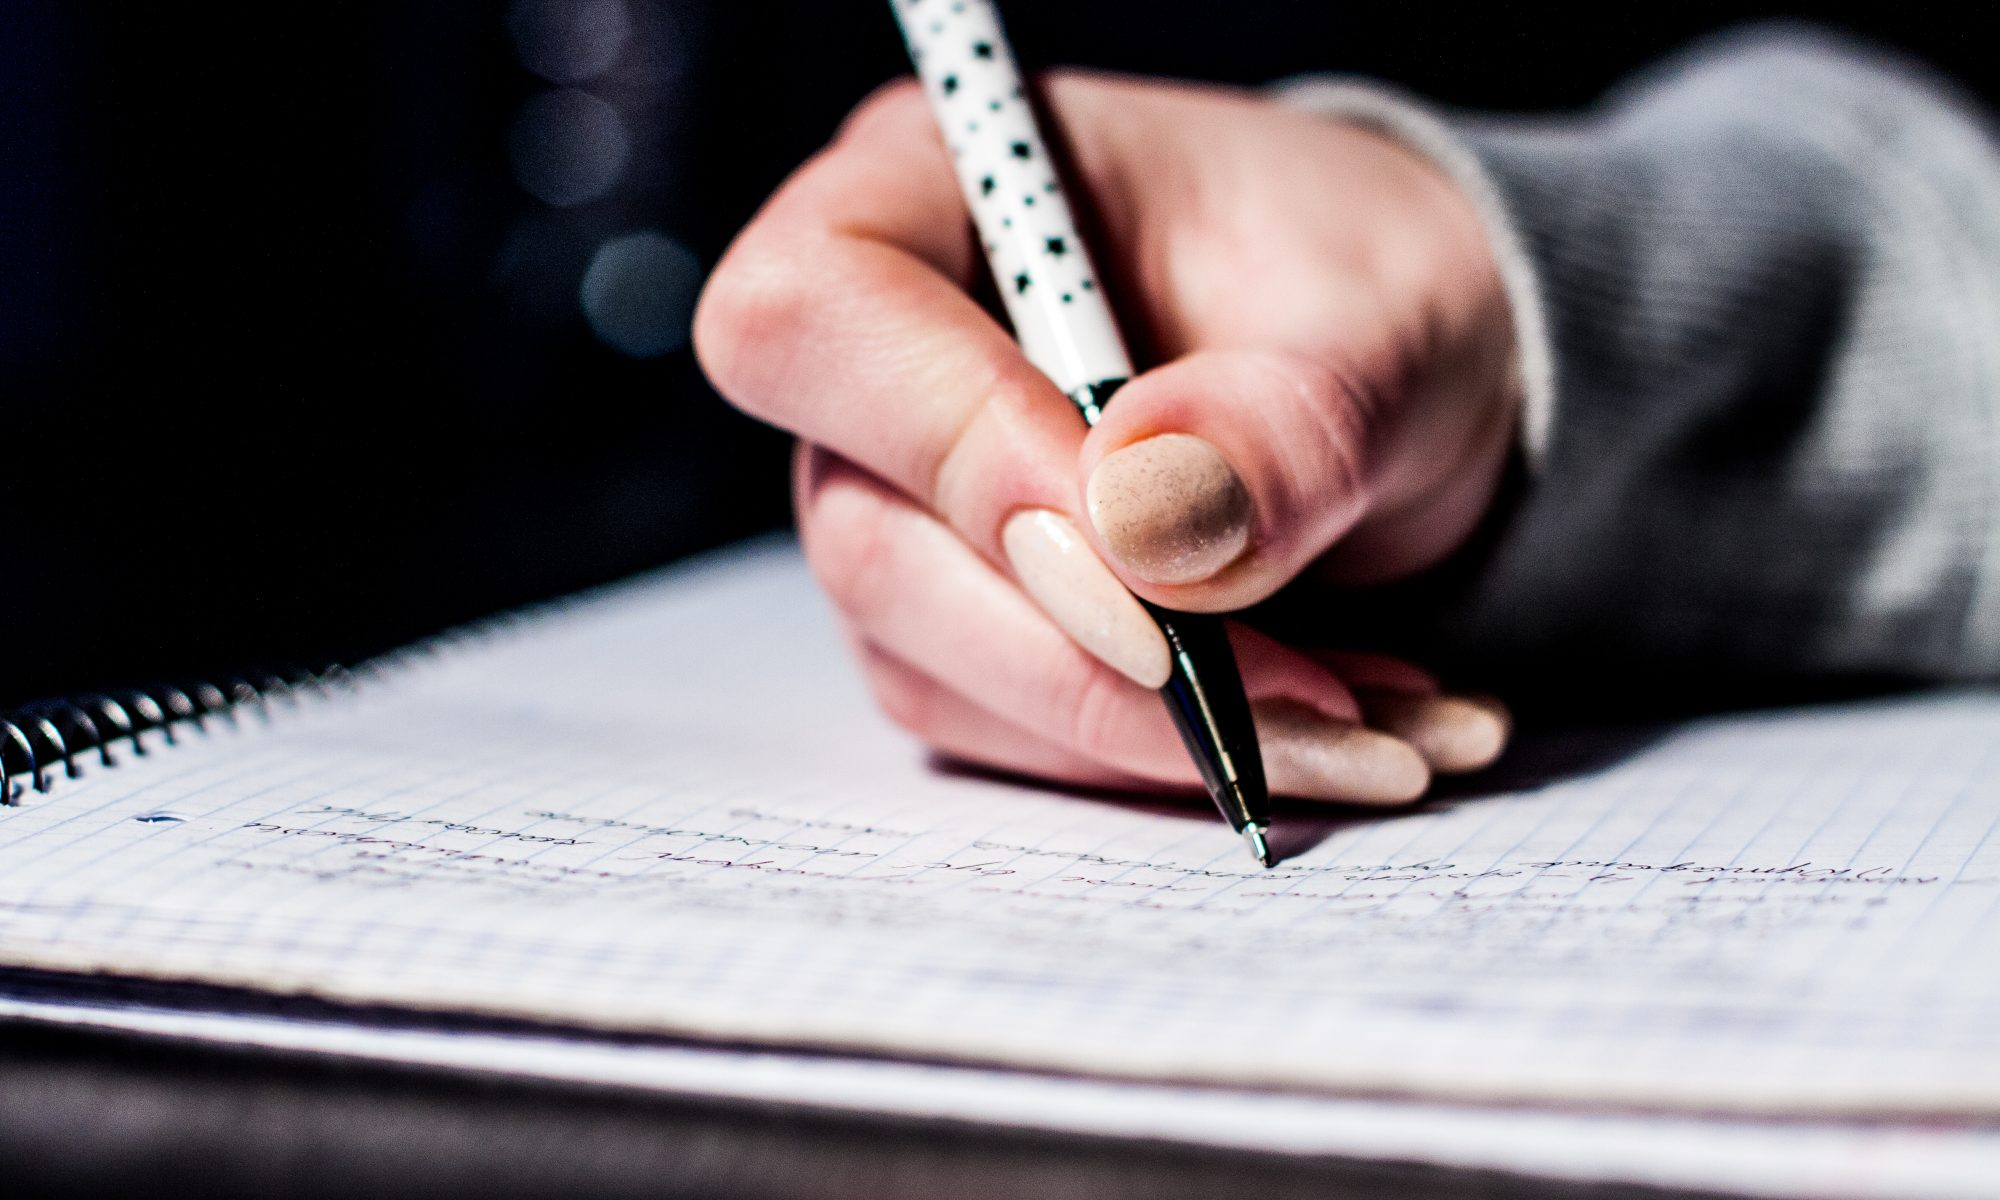 certifying examination